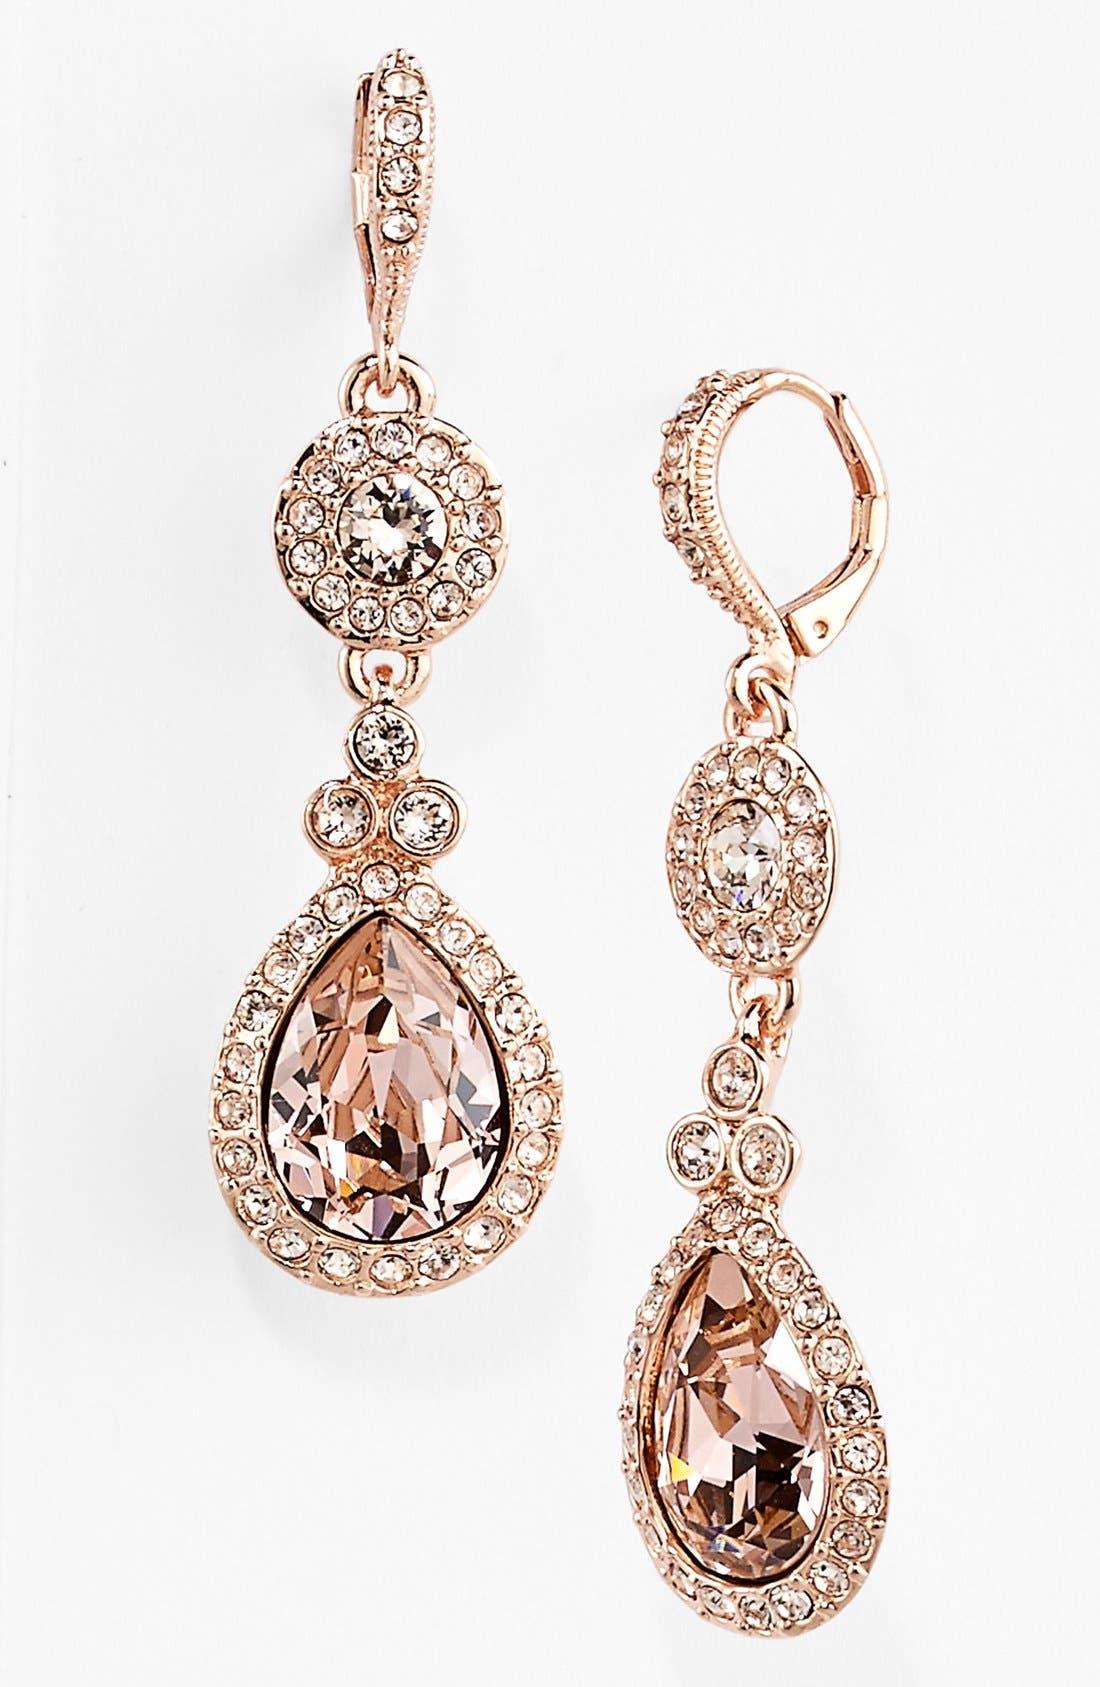 Crystal Teardrop Earrings,                             Main thumbnail 1, color,                             600